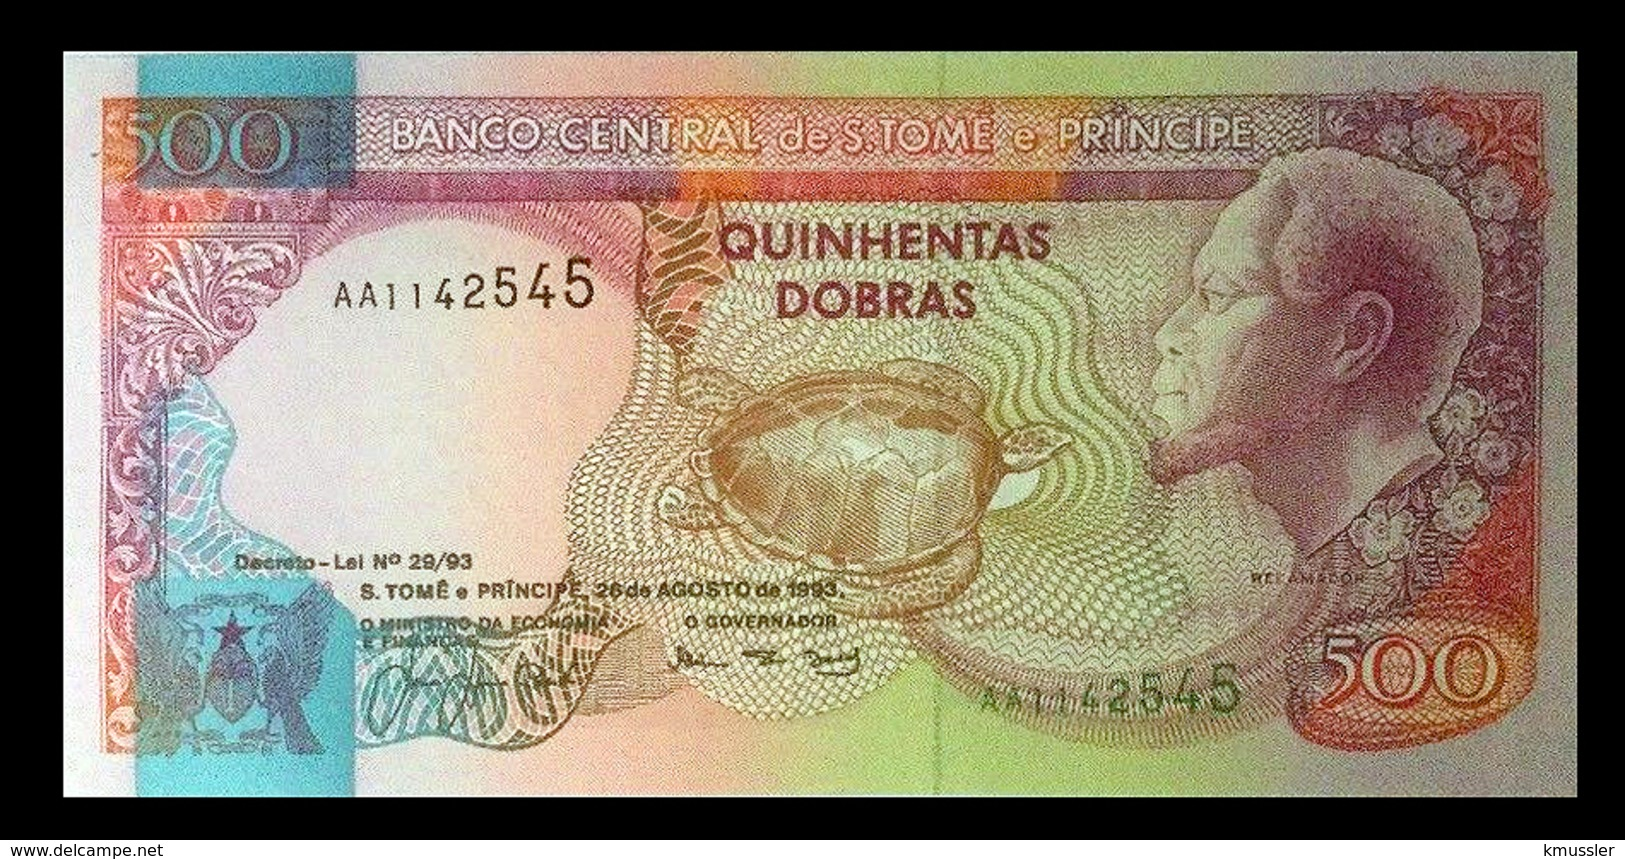 # # # Banknote Tome Und Principe 500 Dobras 1993 UNC # # # - São Tomé U. Príncipe